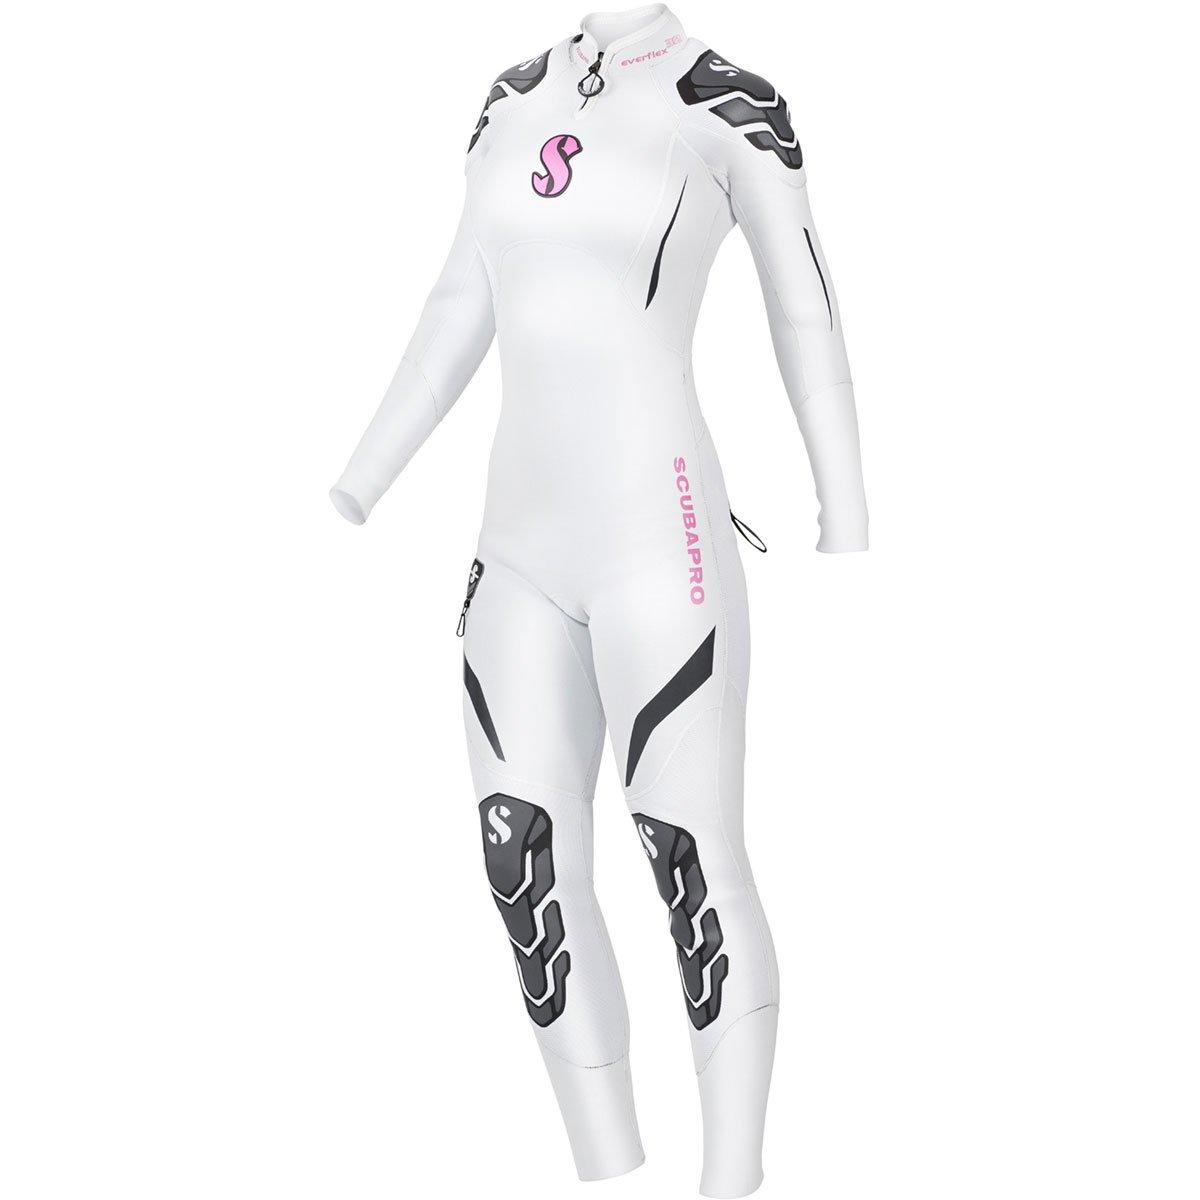 bb3ef3adbe Amazon.com  ScubaPro Women s Everflex Steamer 3 2mm Wetsuit (Medium ...